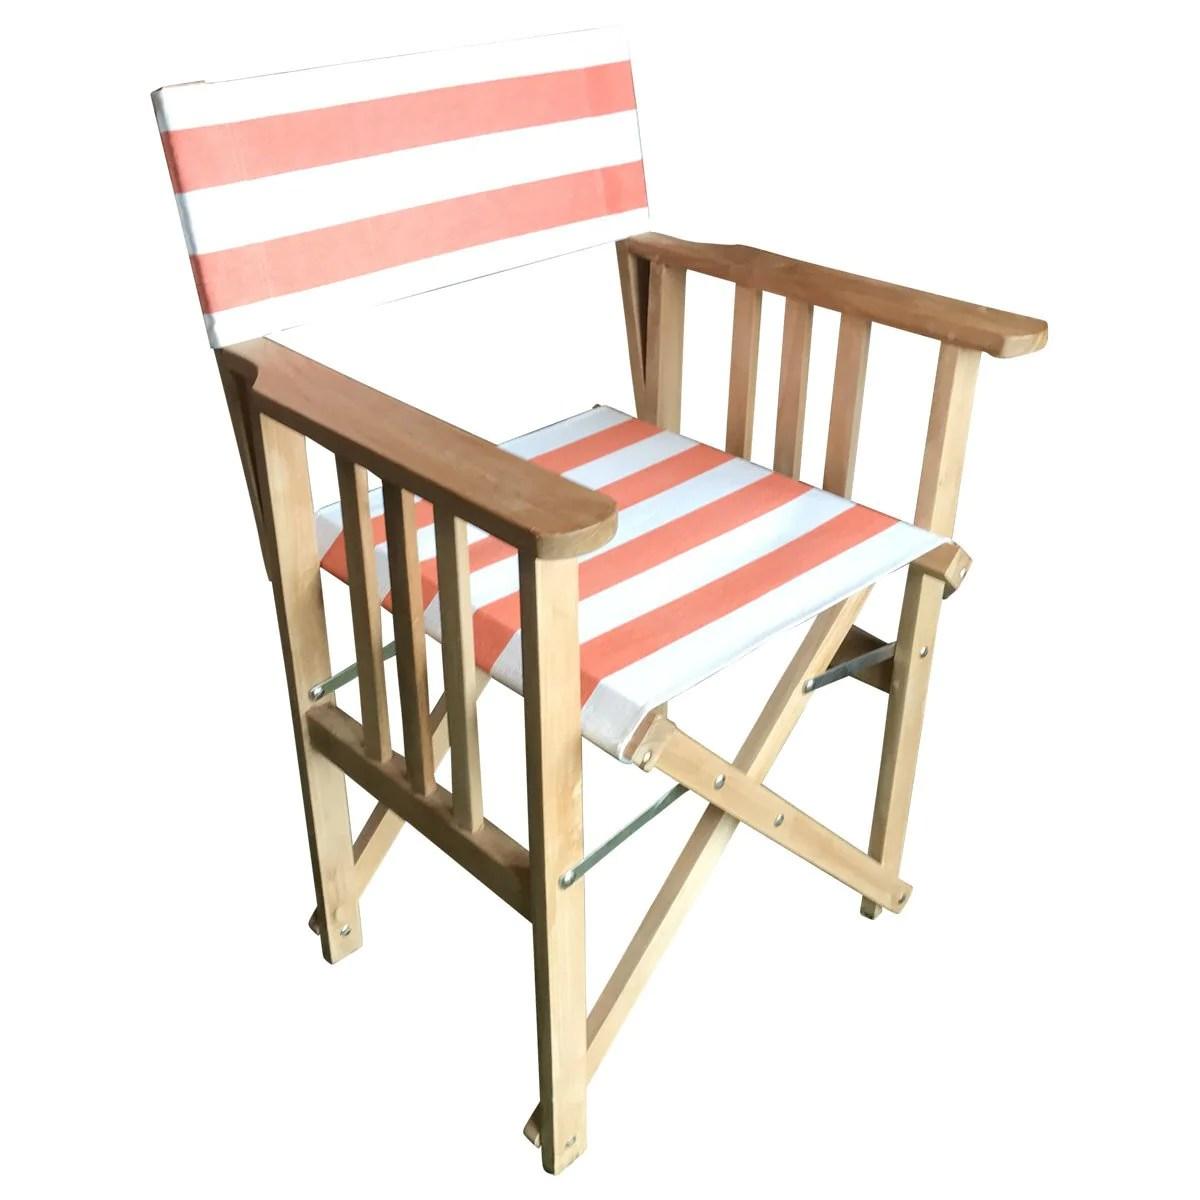 striped directors chairs red bean bag chair jousting deckchair stripes